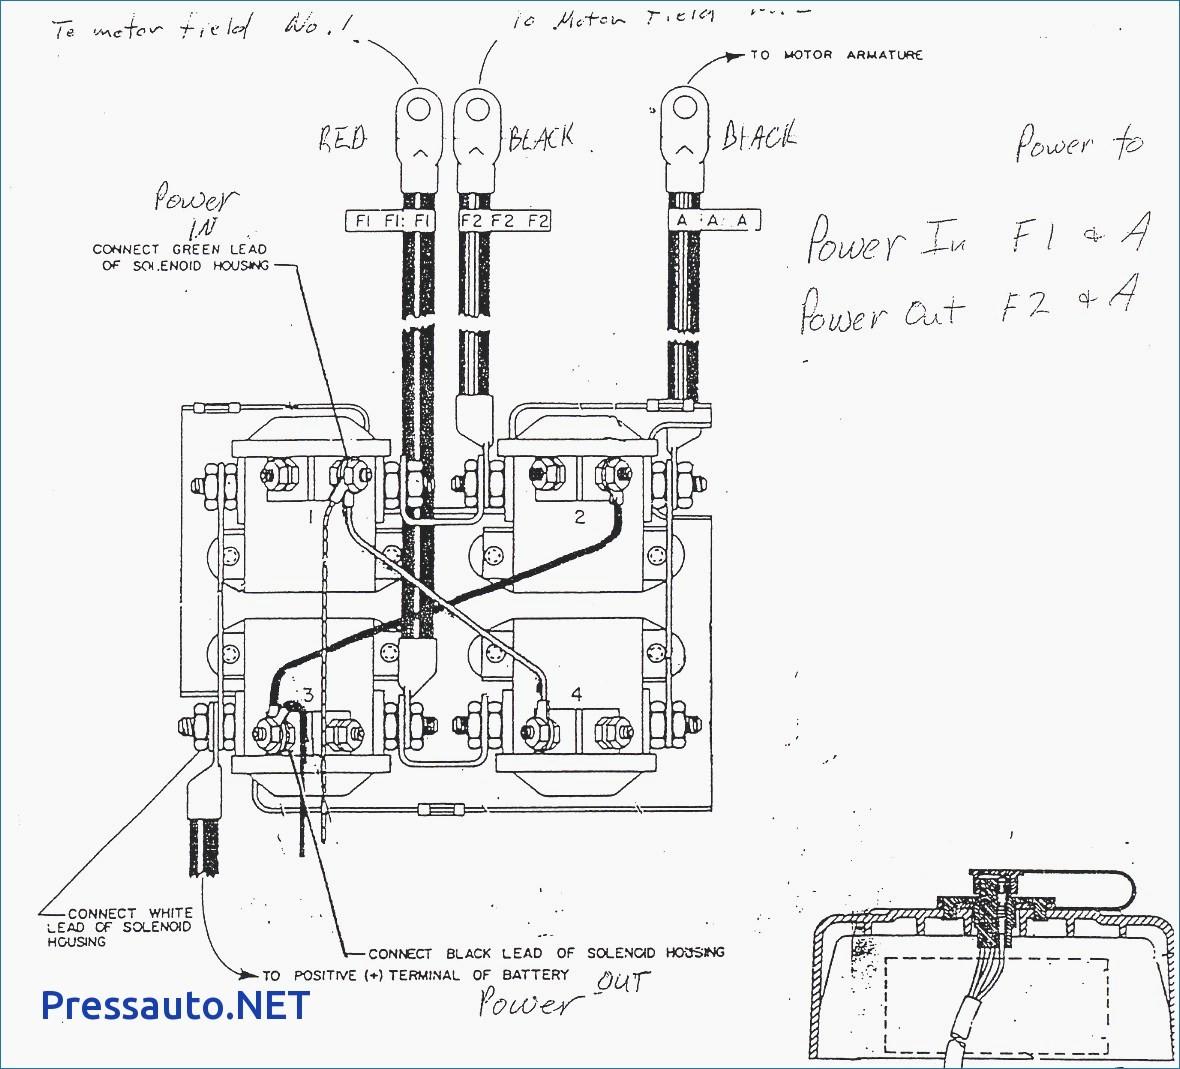 Warn M8000 Winch Wiring Diagram Gooddy Org Inside Radiantmoons Me In